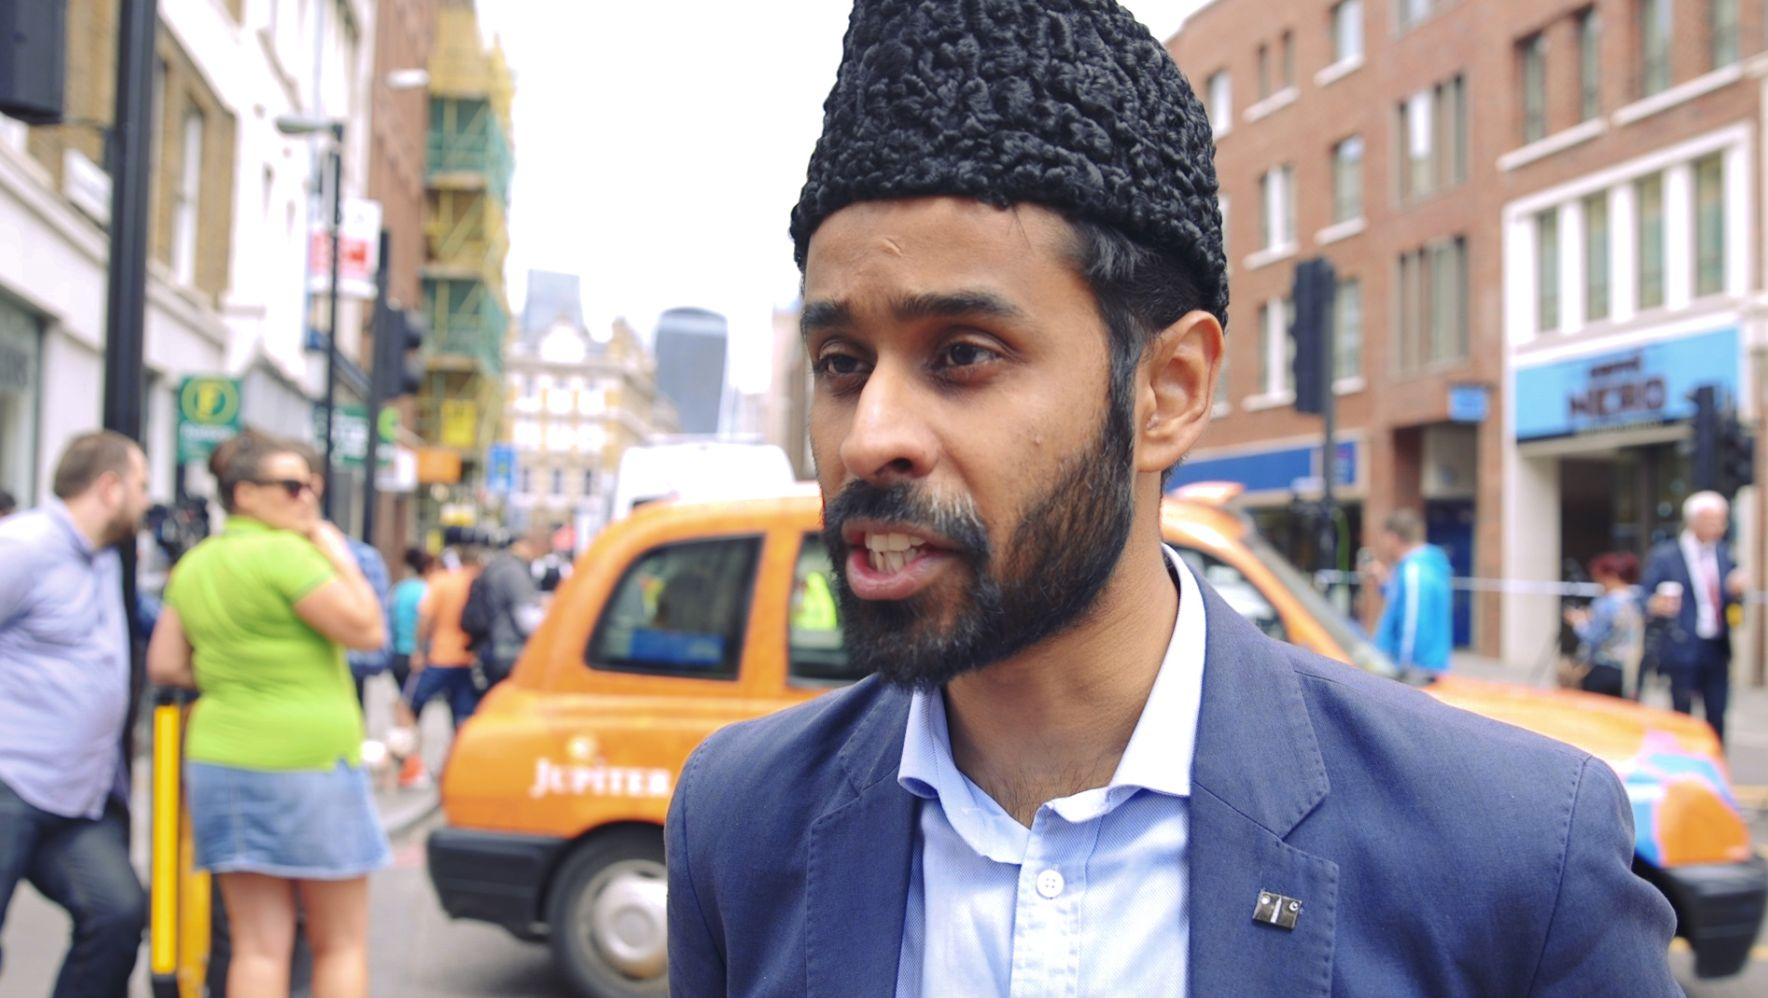 Ahmadiyya Muslim Community ImanAbdul Quddus Arif said his 'heart was bleeding' over the attack...